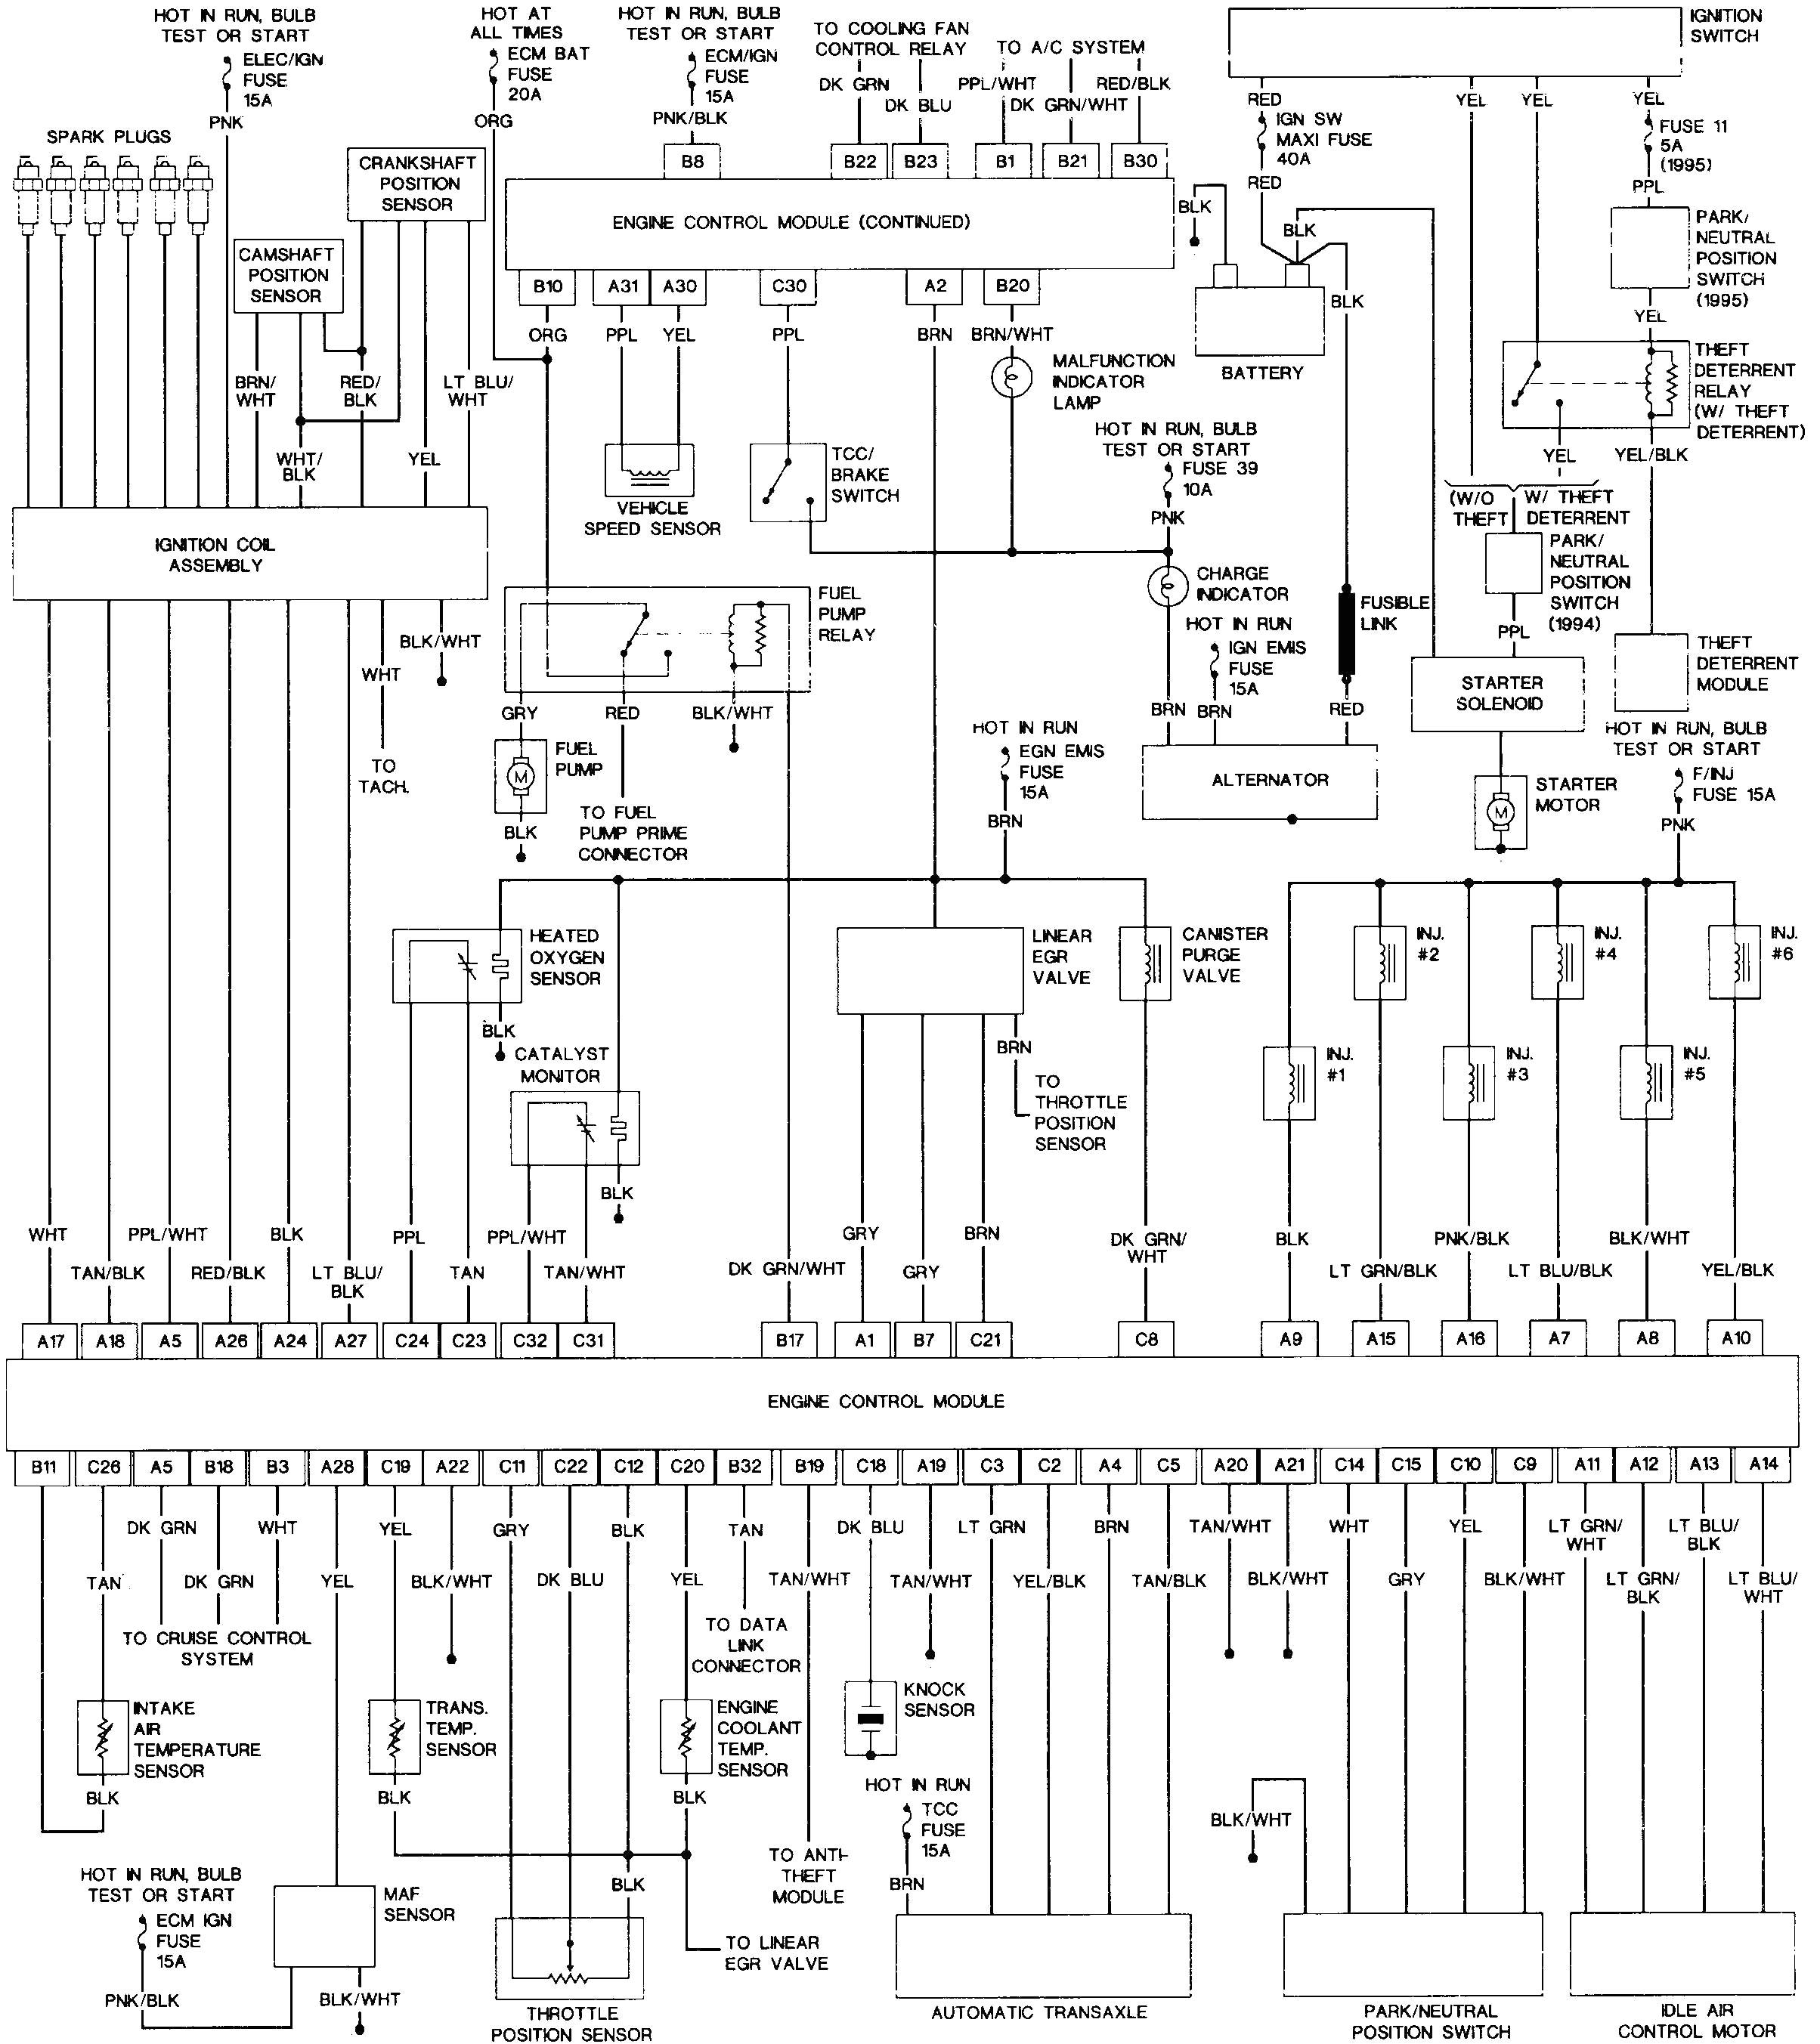 99 buick lesabre abs diagram wiring diagram expert 2002 buick century abs wiring diagram 2001 buick